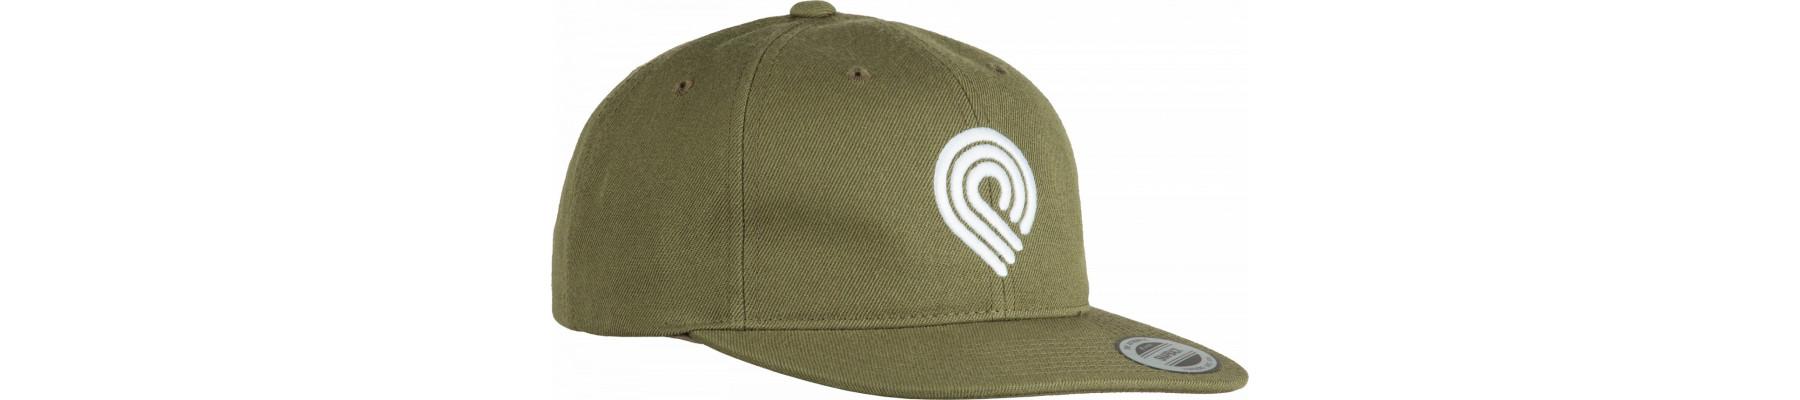 Powell Peralta 3P Military Green